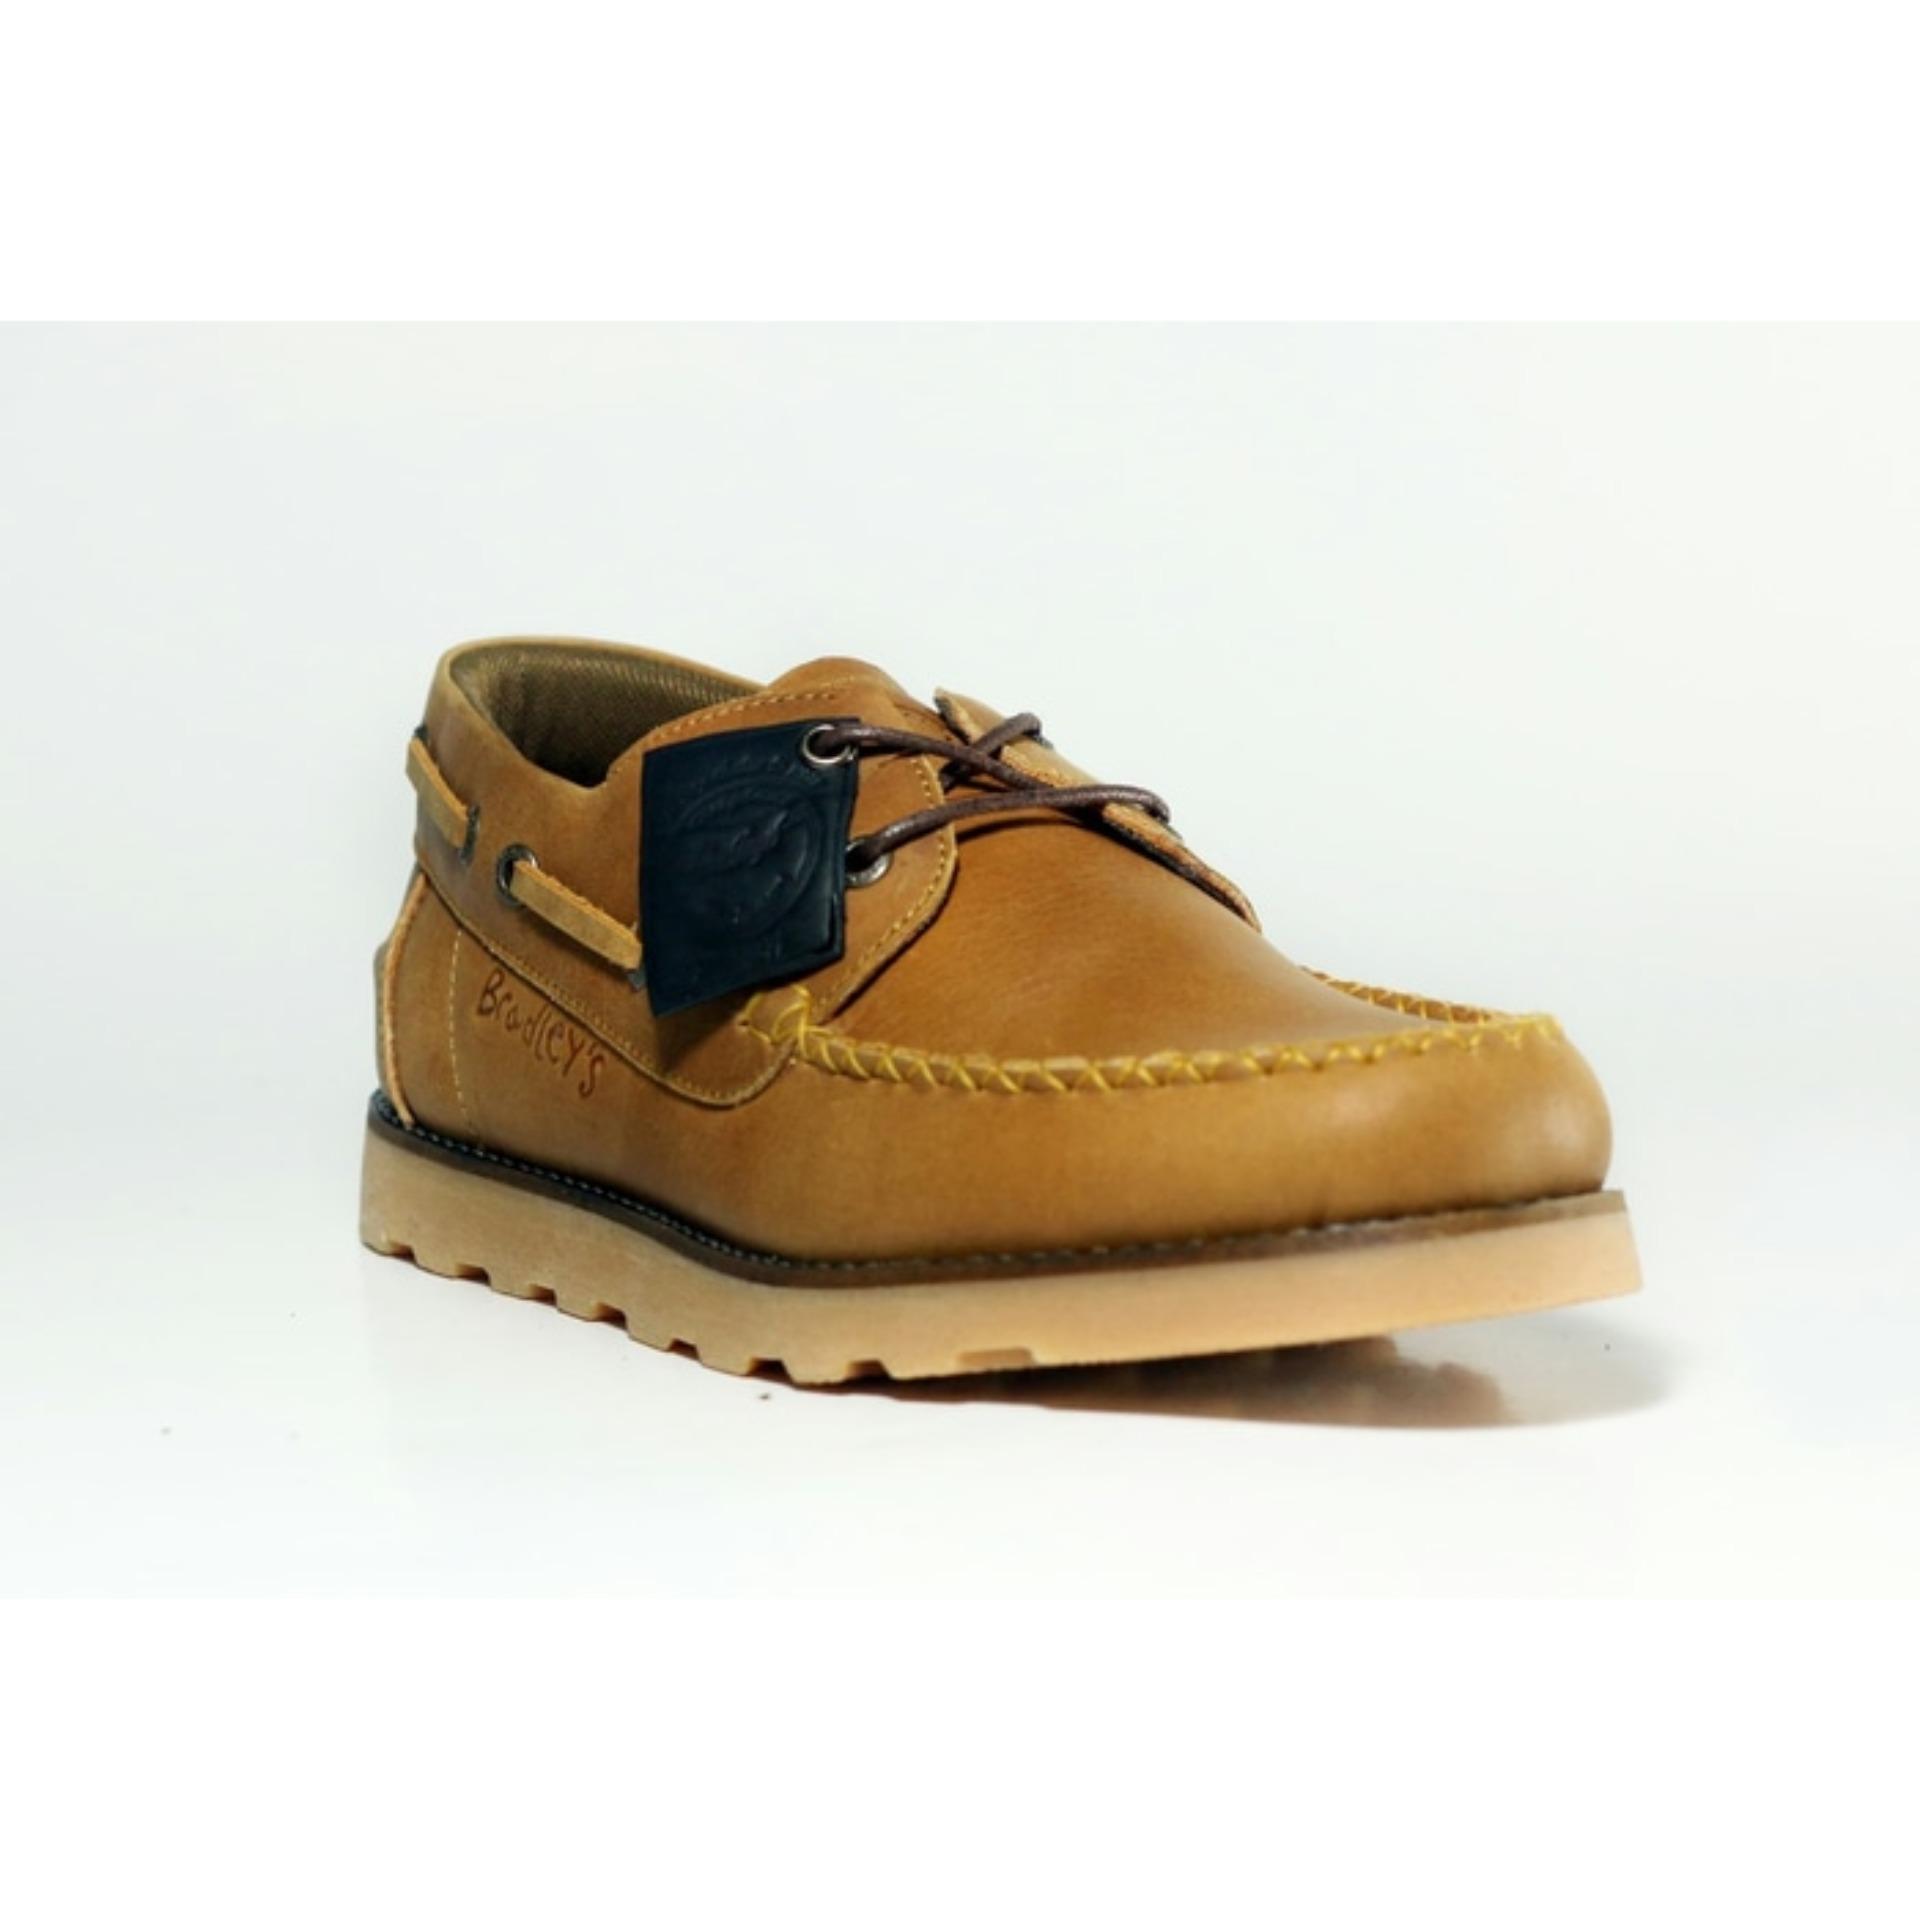 Sepatu bradleys zapato kulit asli